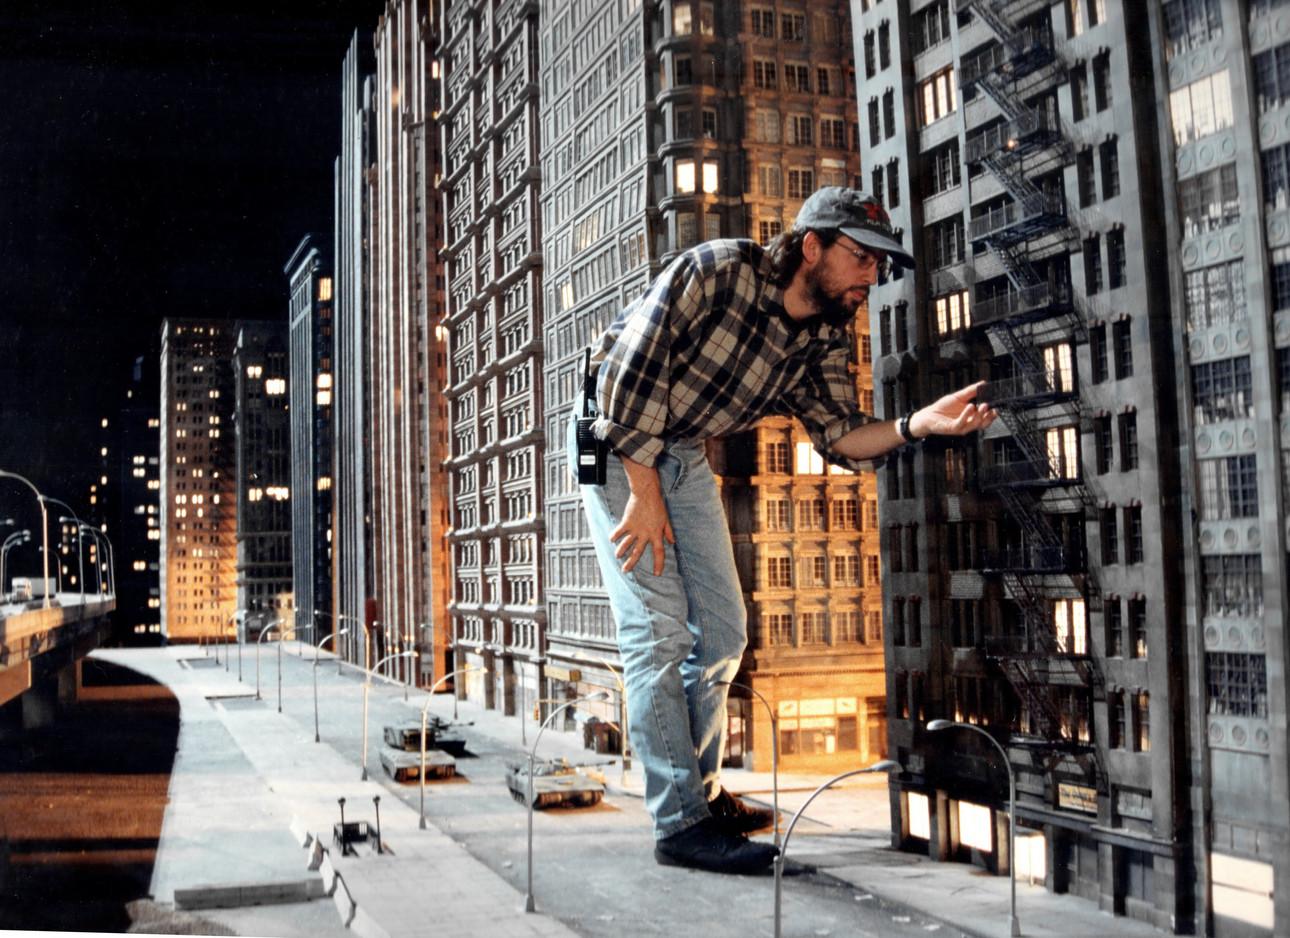 VFX Supervisor Volker Engel with NY miniature